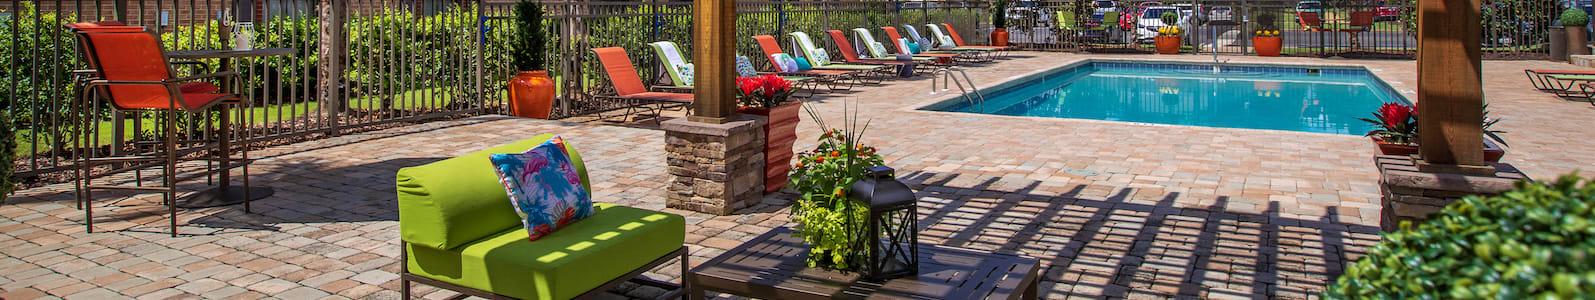 swimming pool and amenity deck at Mills at 601